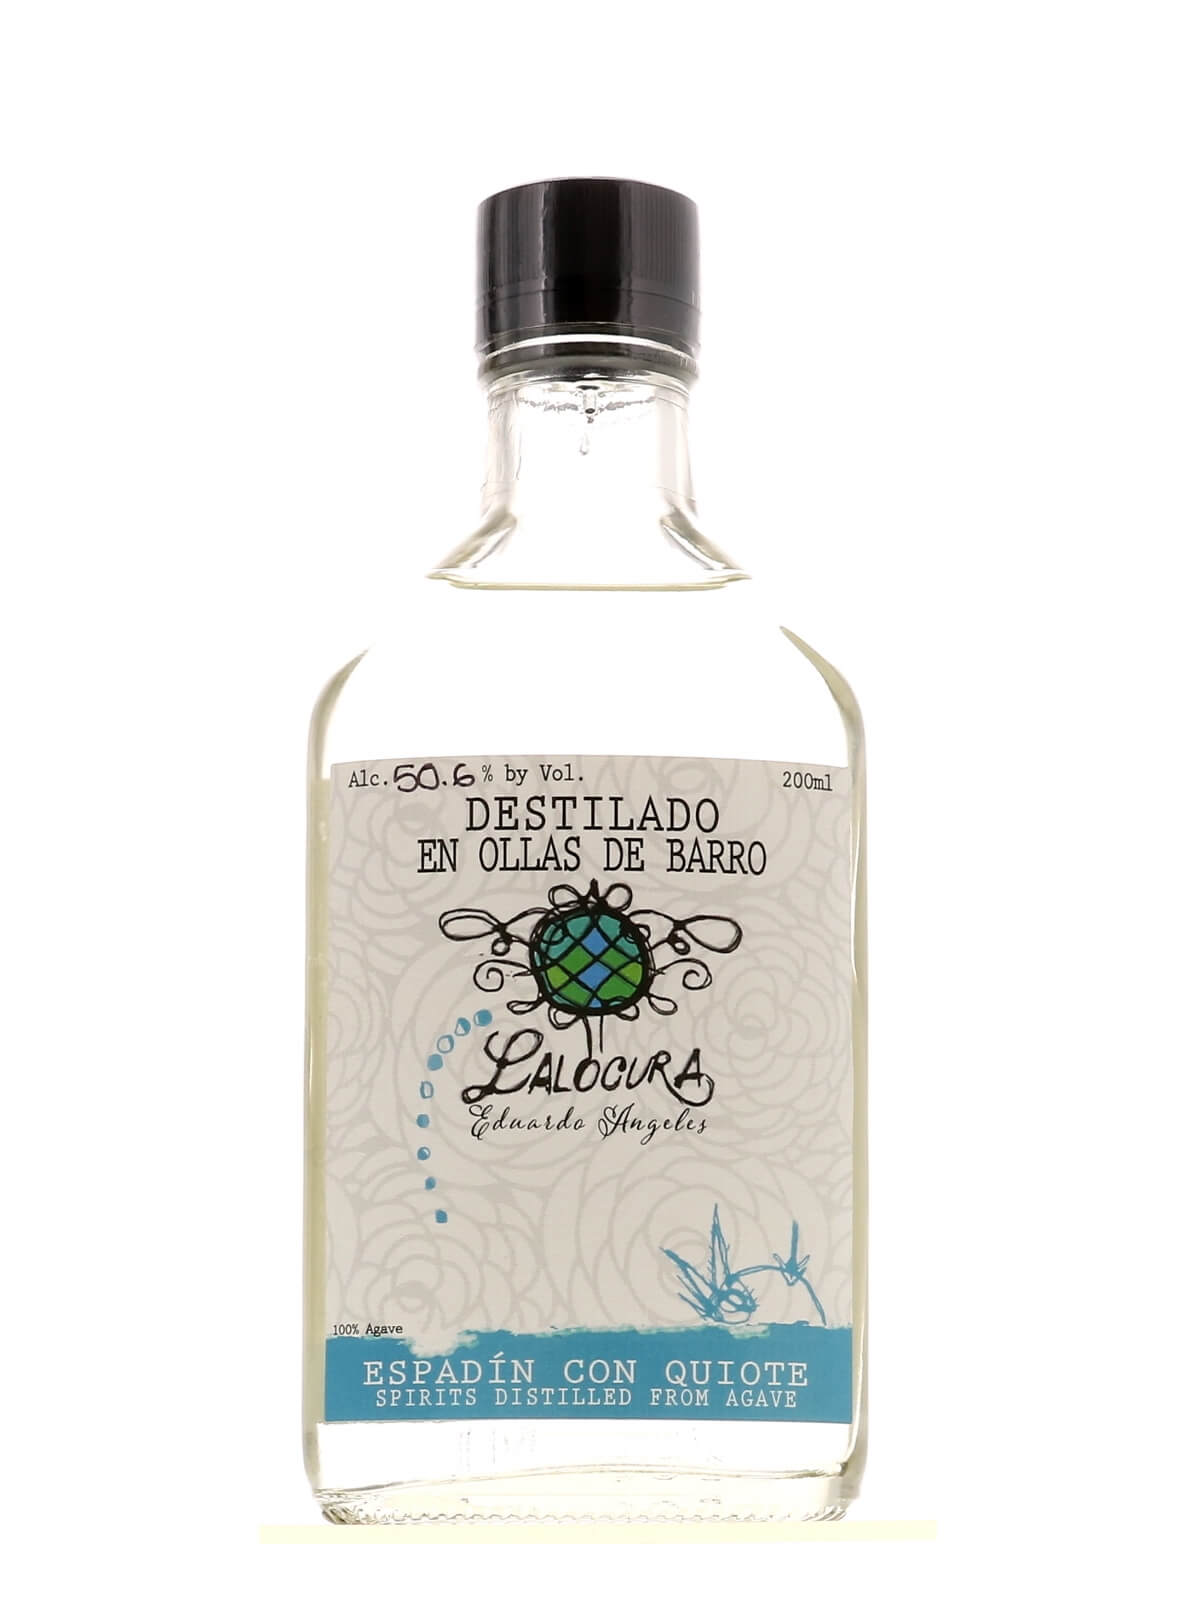 Lalocura Espadin con Quiote 200ml bottle from Agave Mixtape